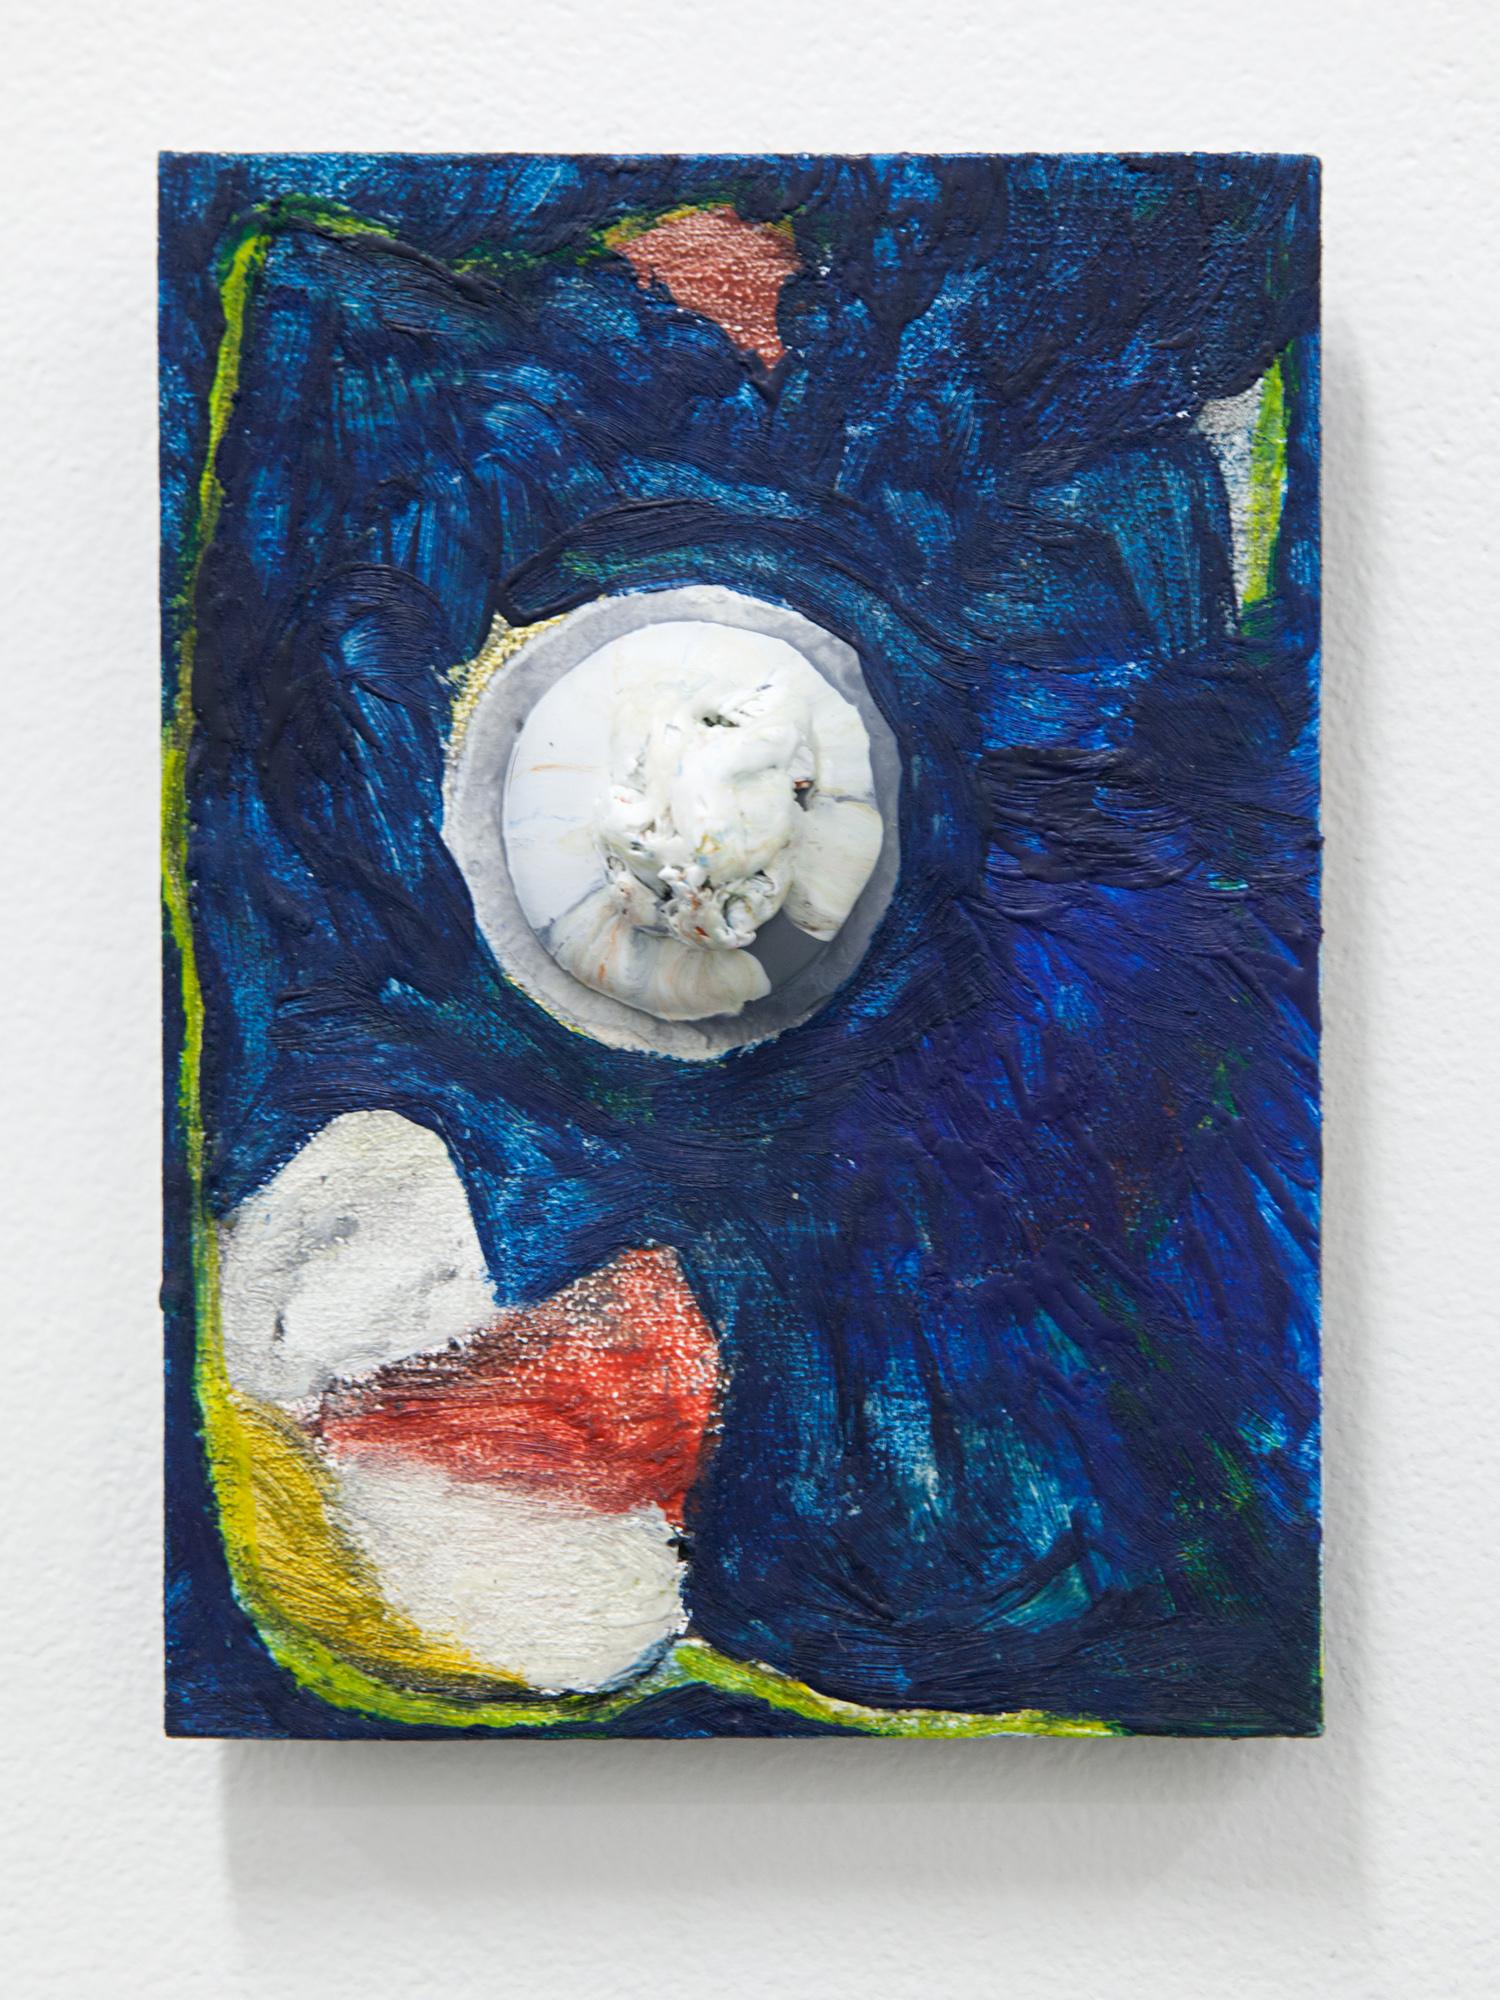 Hot surface edit (Alexander Calder)